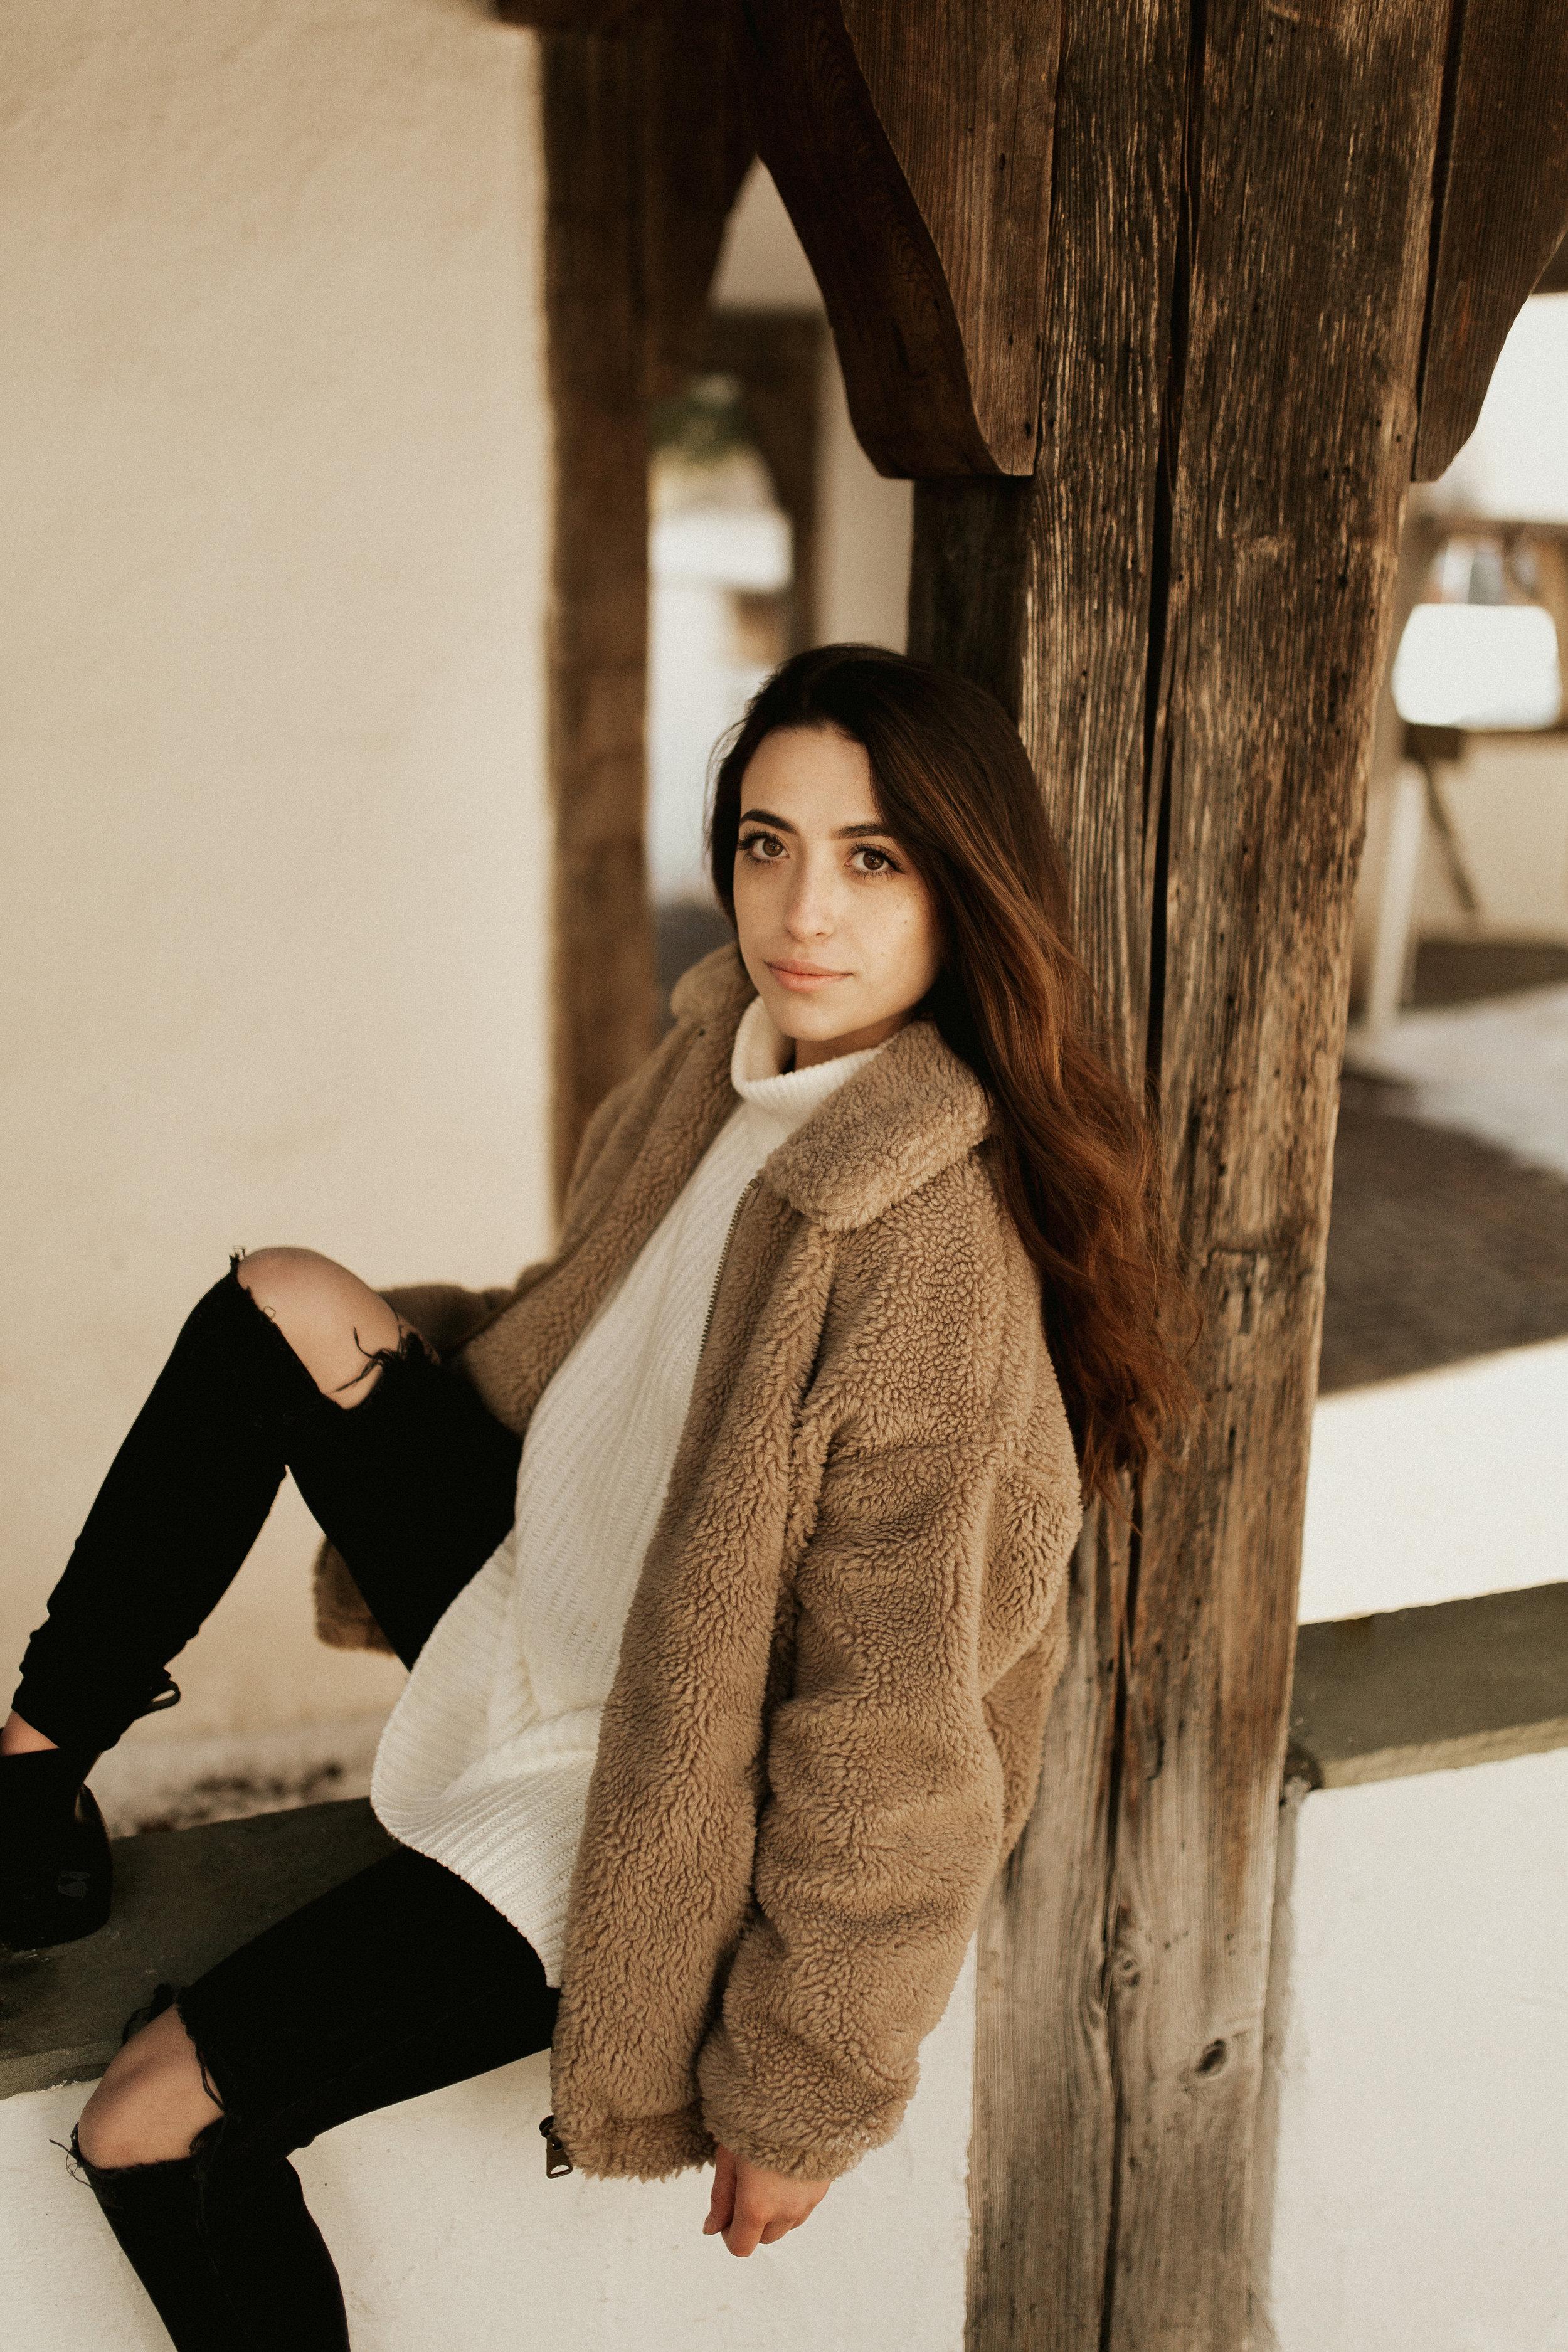 Arianna_Portraiture_82.jpg